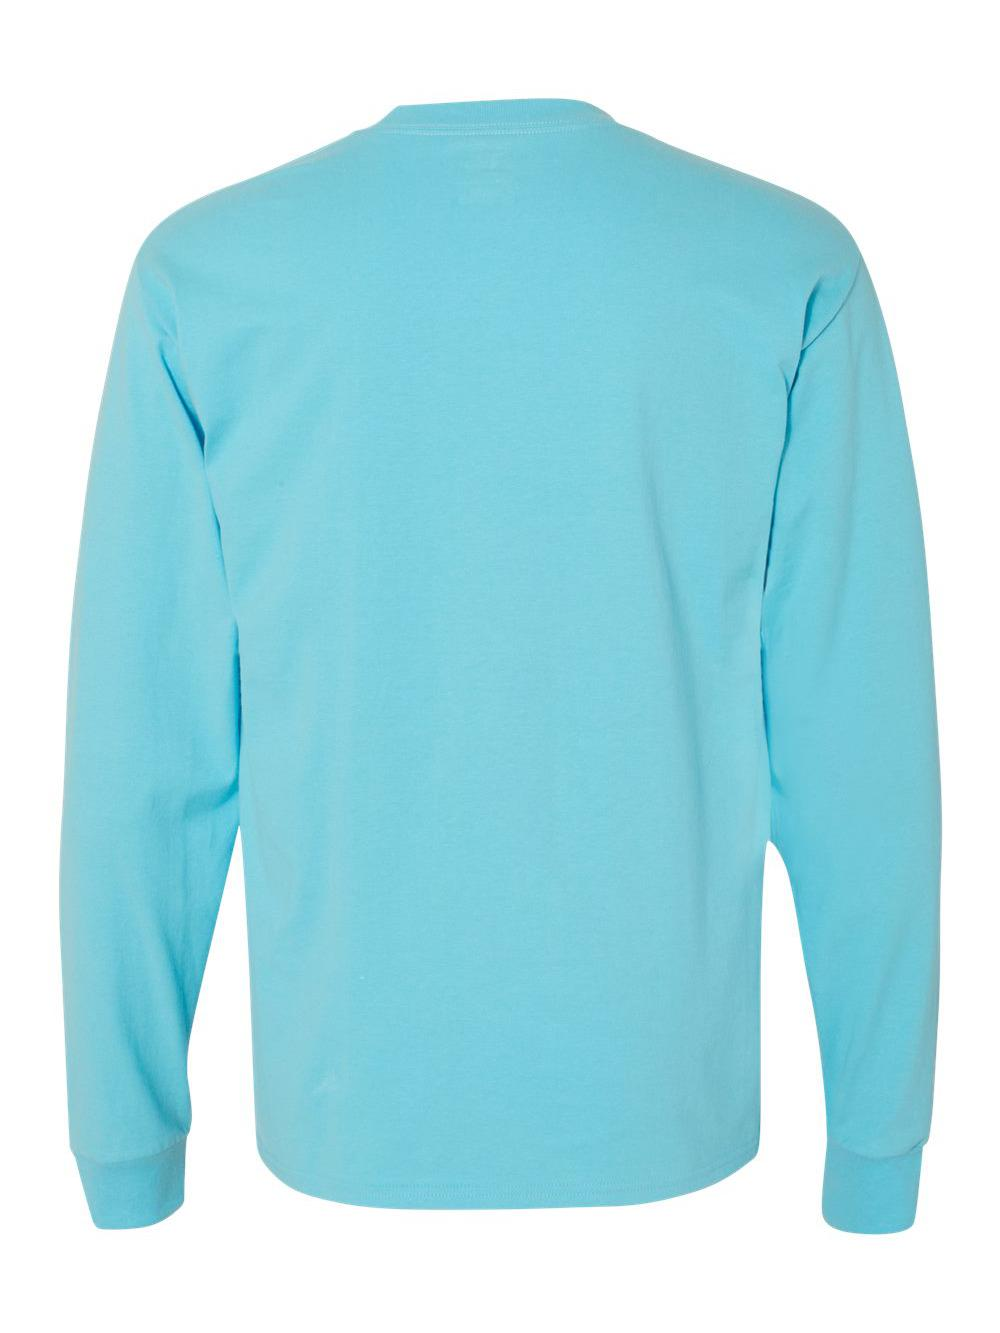 Hanes-Beefy-T-Long-Sleeve-T-Shirt-5186 thumbnail 10